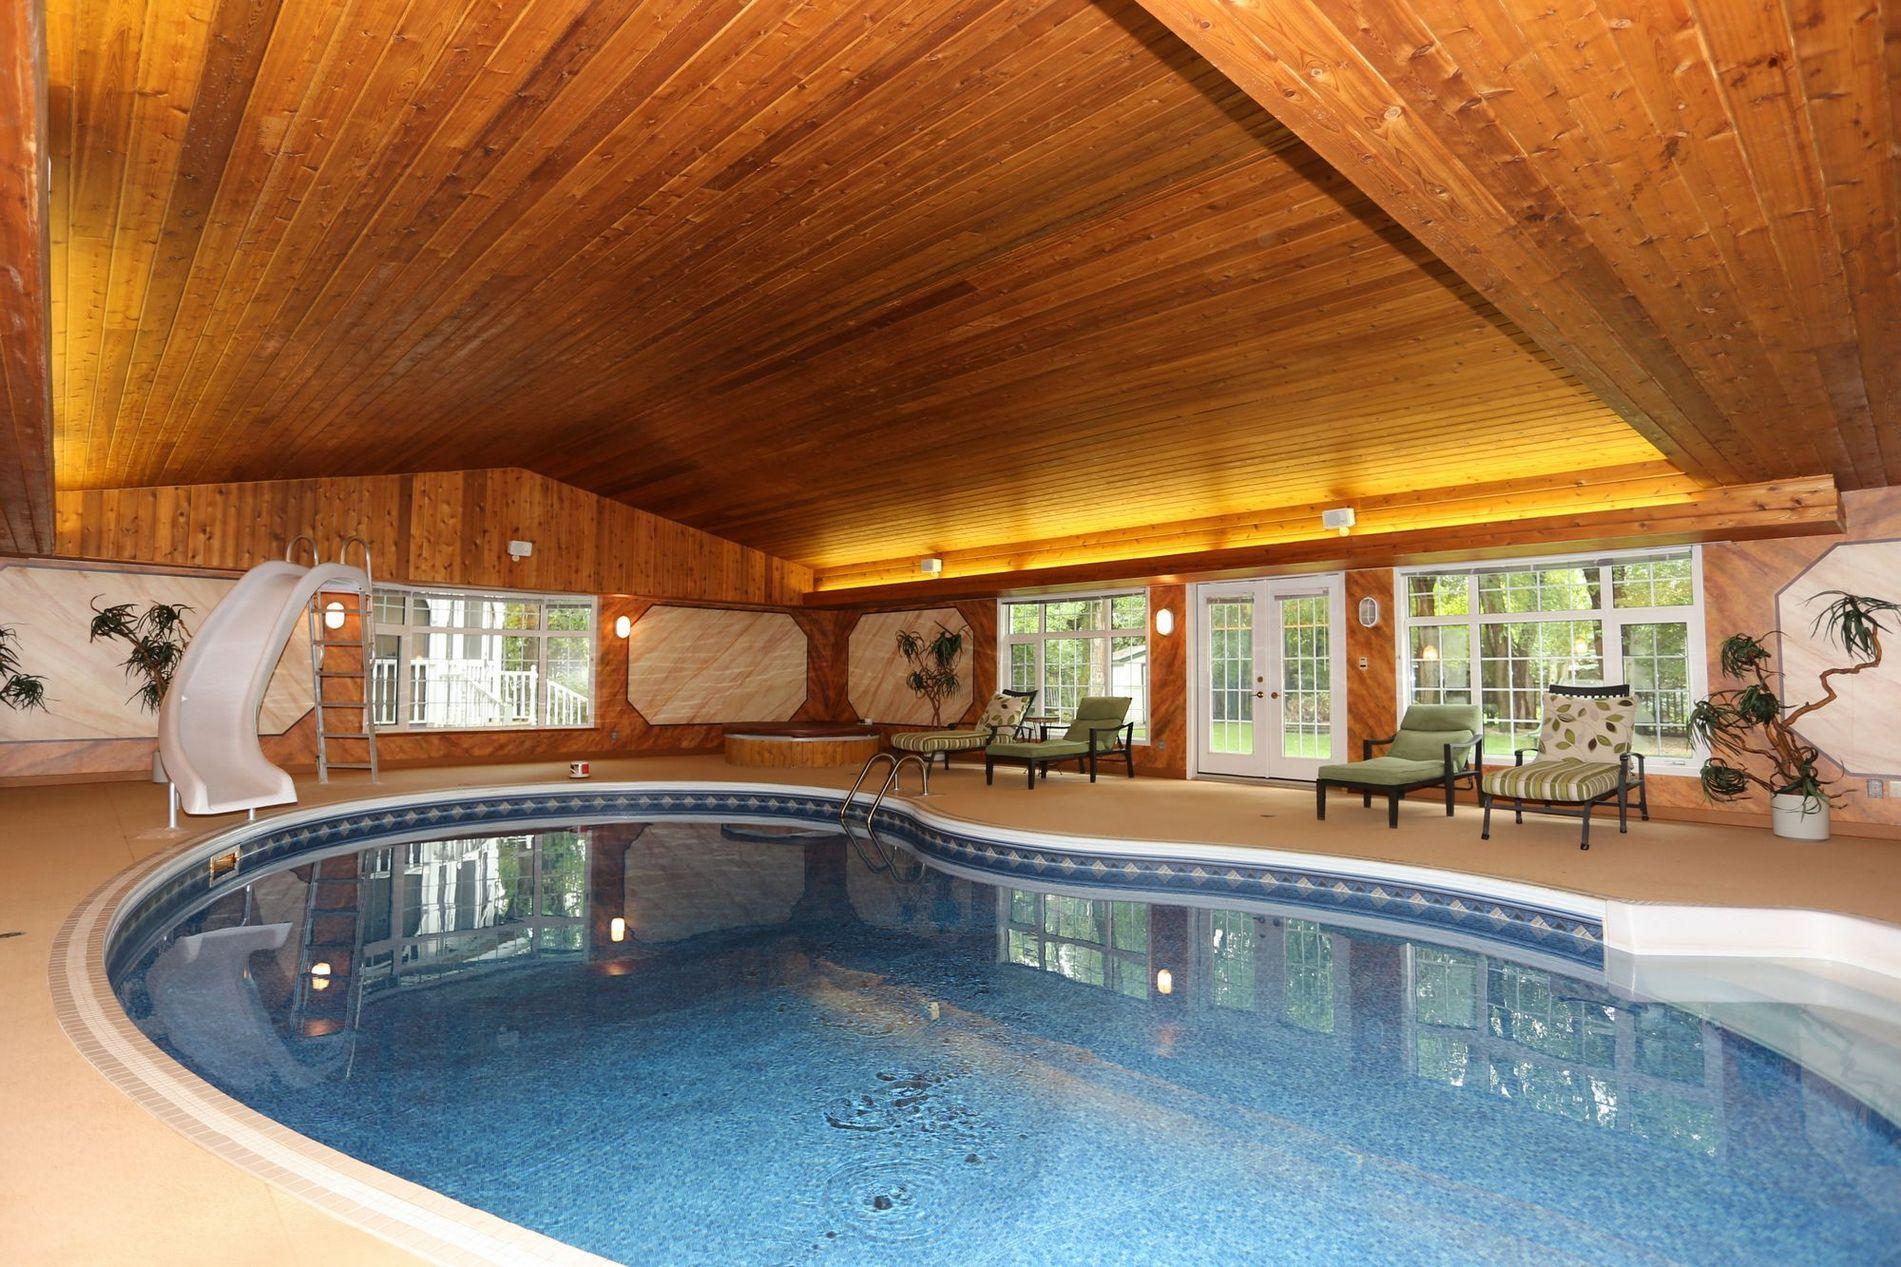 Indoor Pool In Tuxedo Winnipeg Real Estate Winnipeg Realtor The